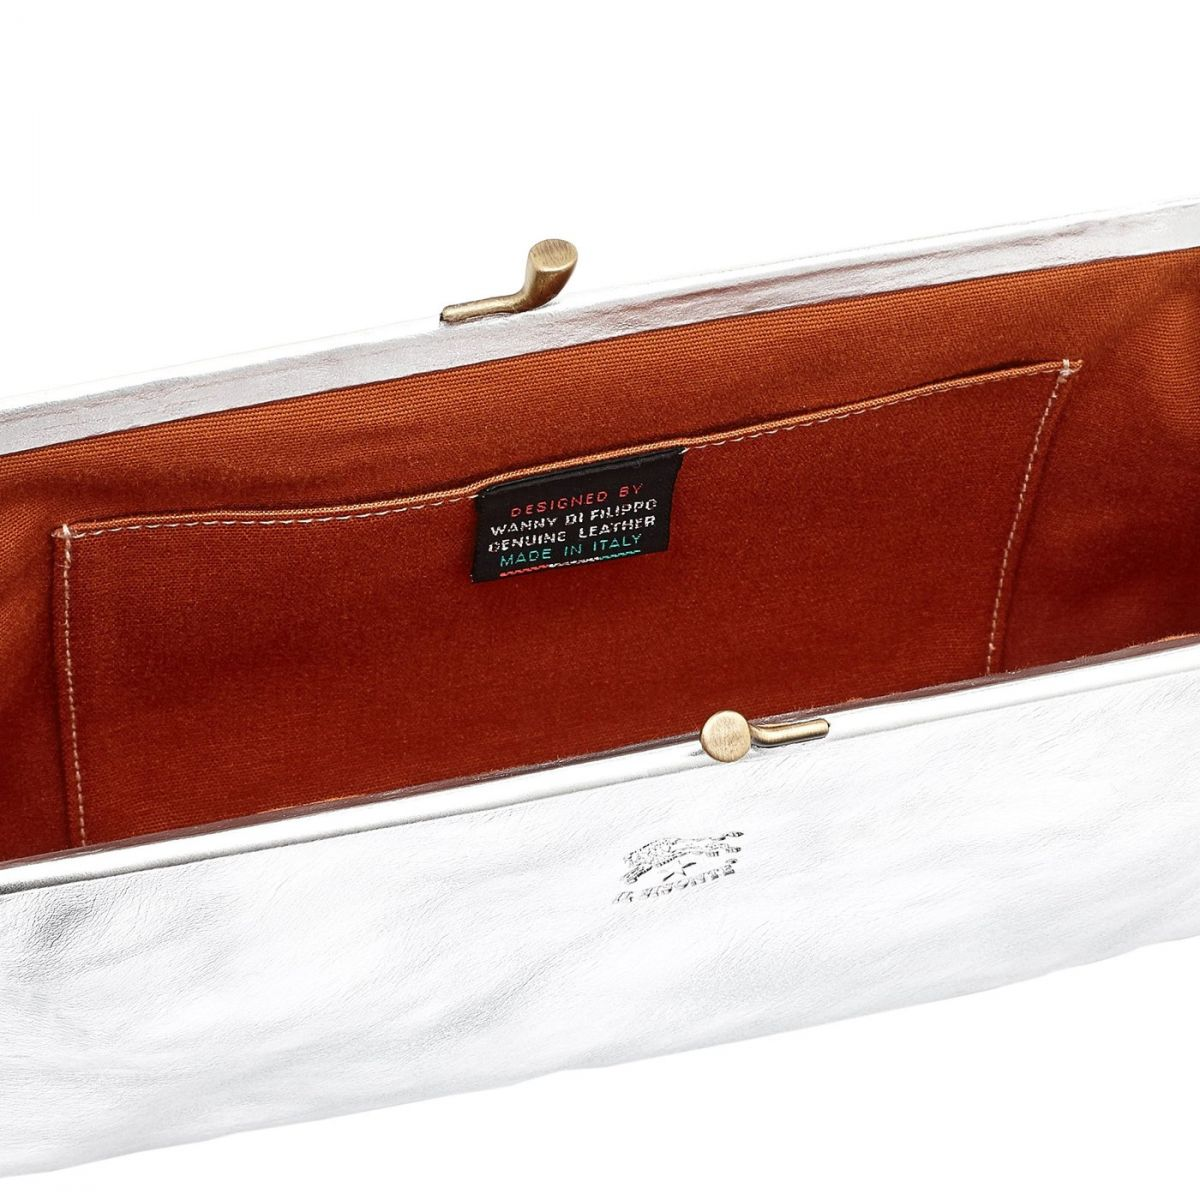 Manuela - Women's Clutch Bag in Metallic Leather color Metallic Silver - BCL027 | Details